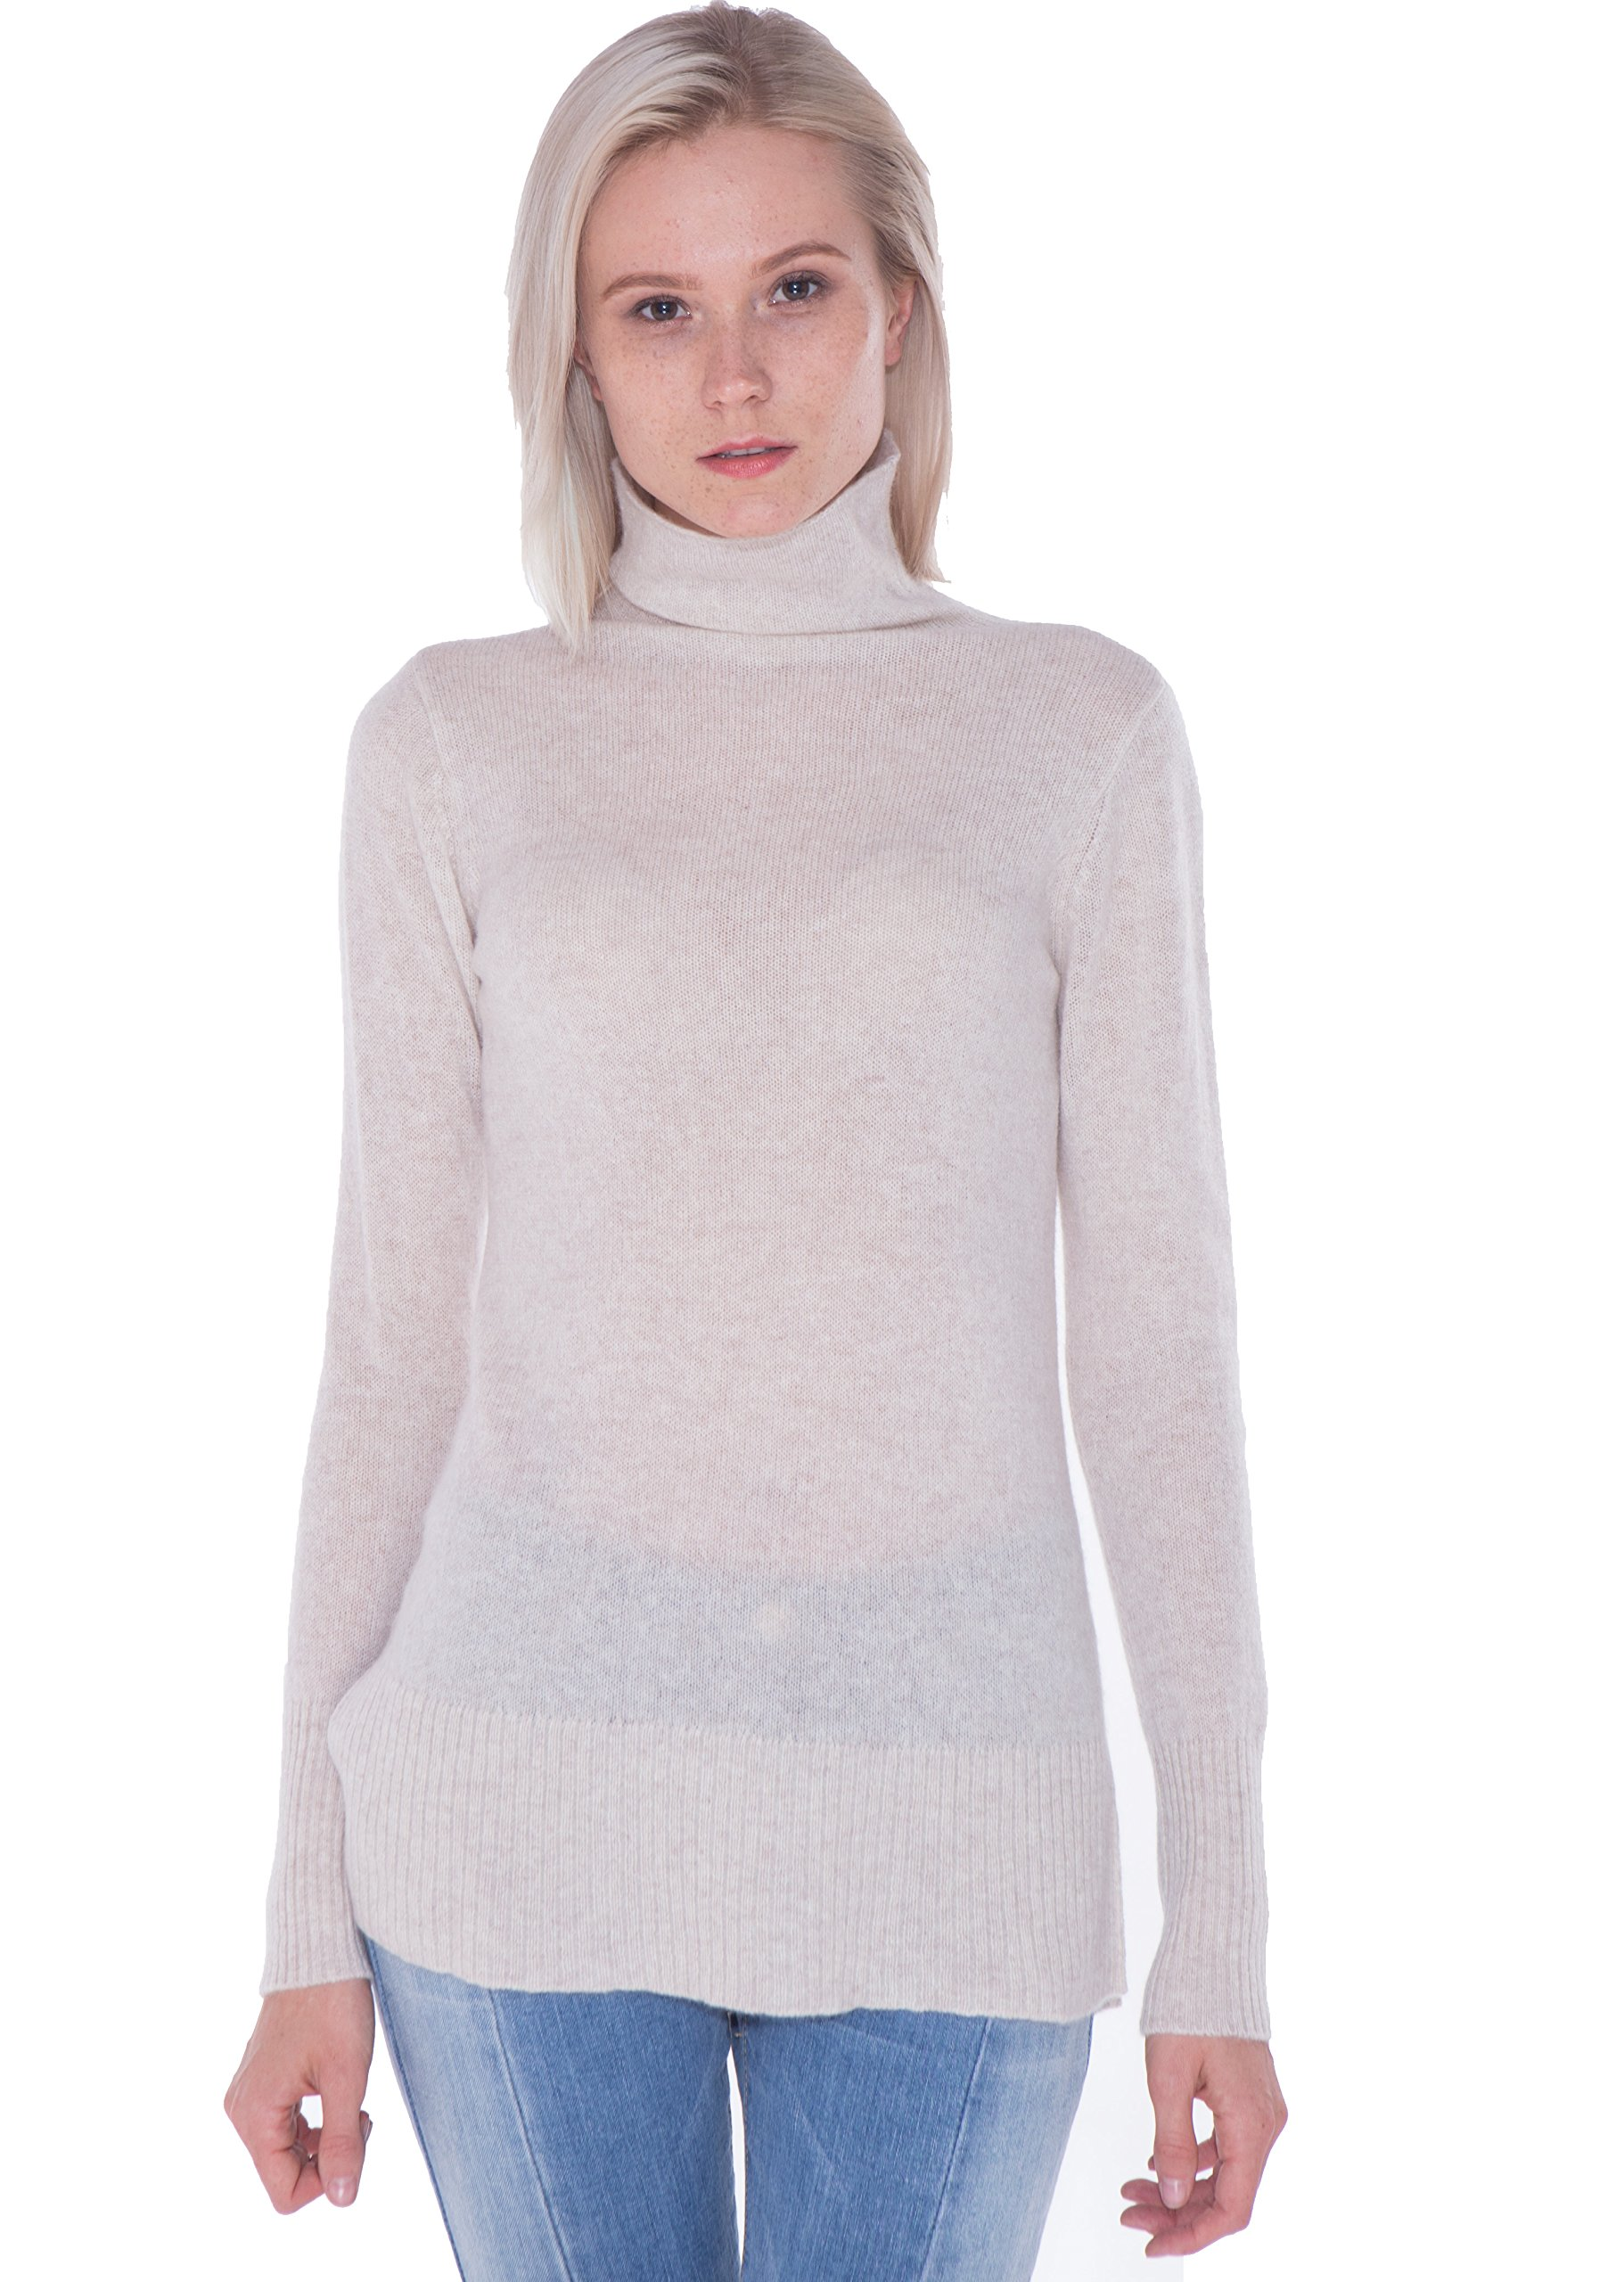 LEBAC Women's 100% Cashmere Thin Long Sleeve Turtleneck Sweater